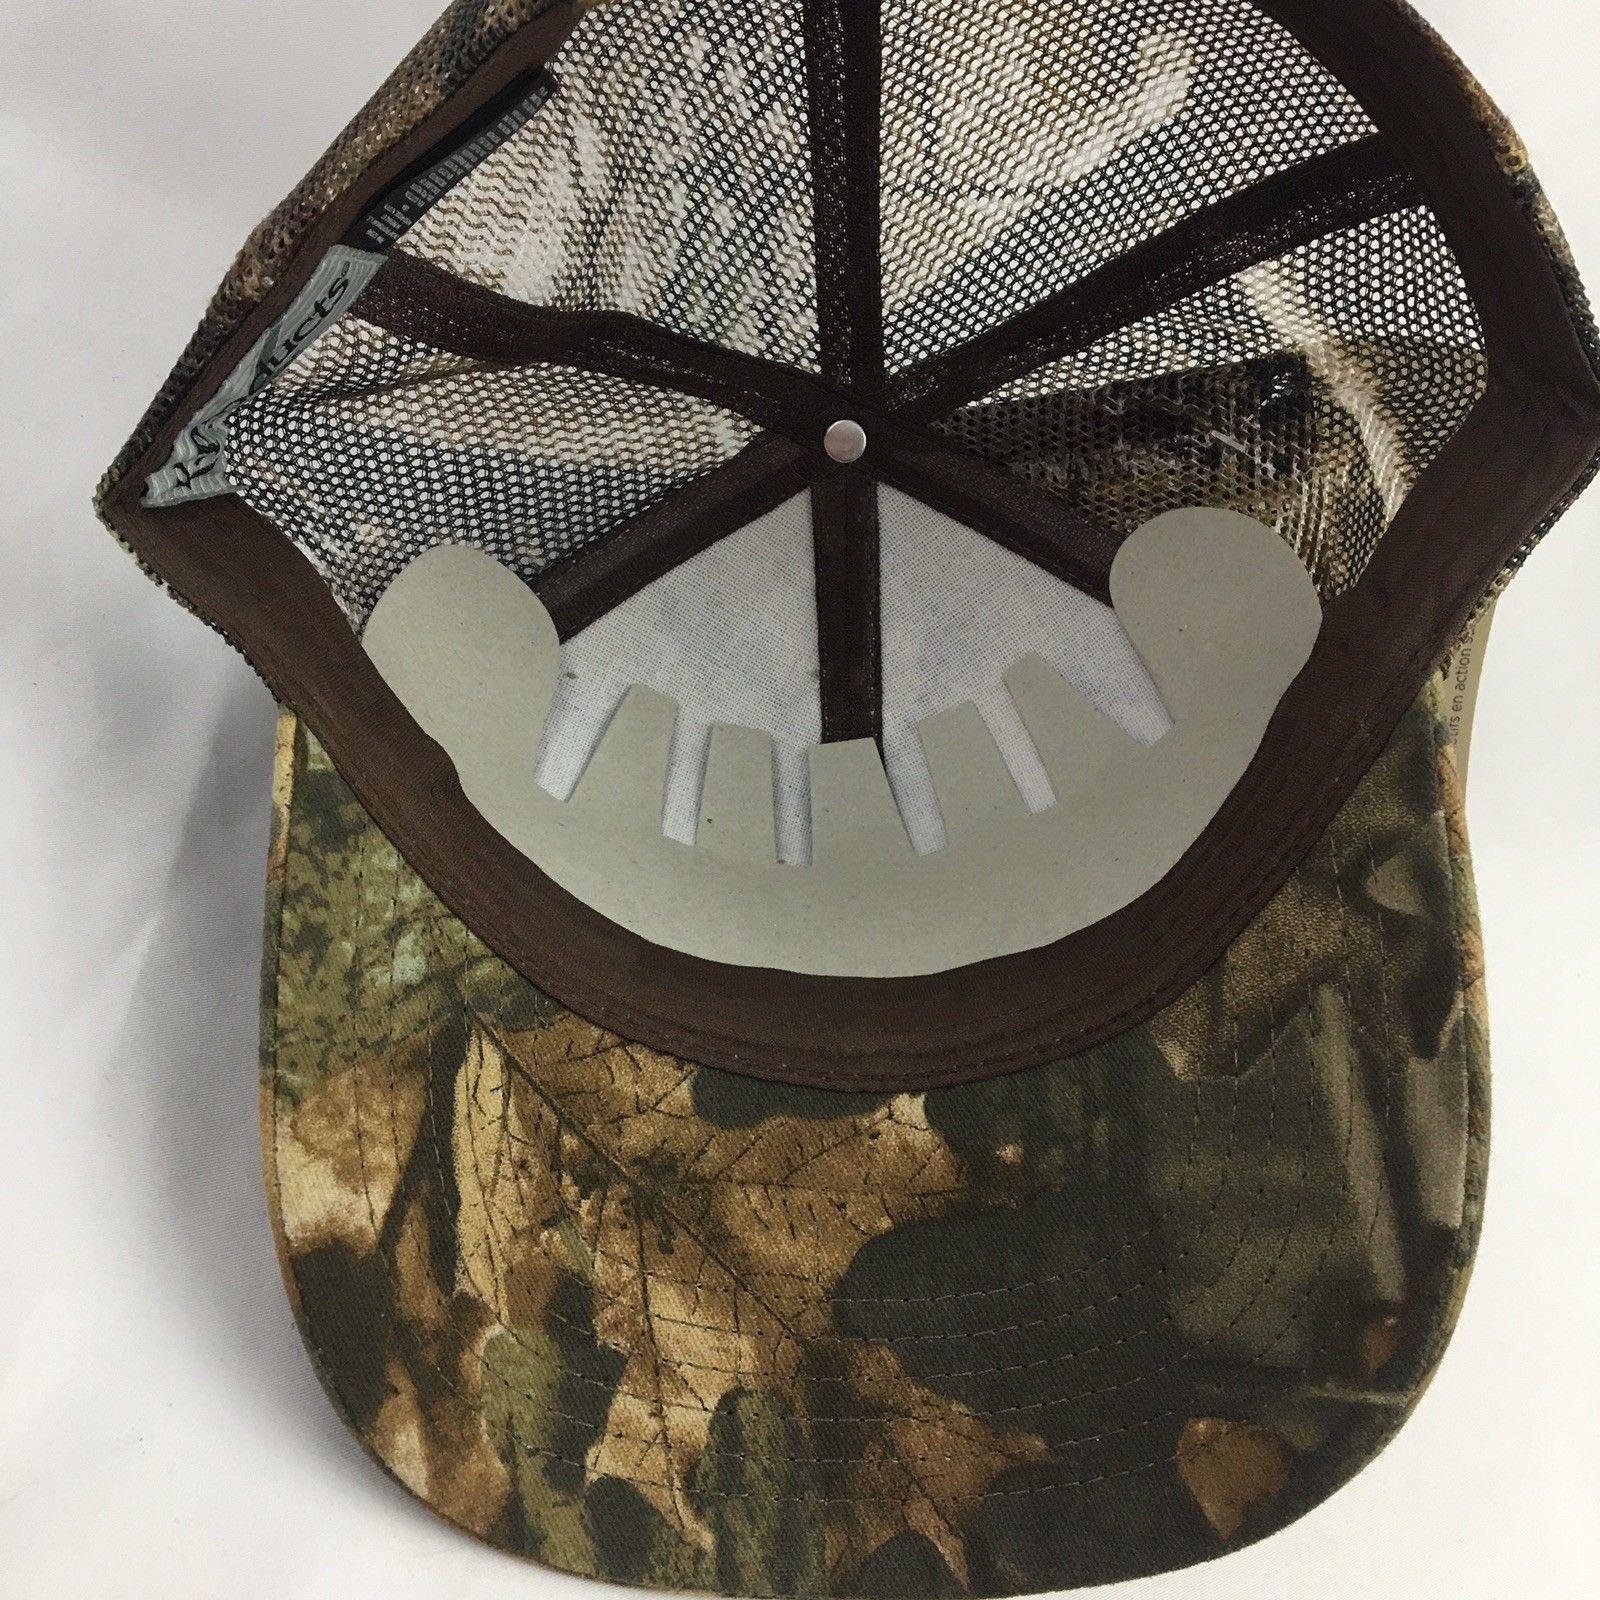 Merschman Seeds Camo Baseball Cap Hat Realtree Camouflage Mesh Mens NWT Brown